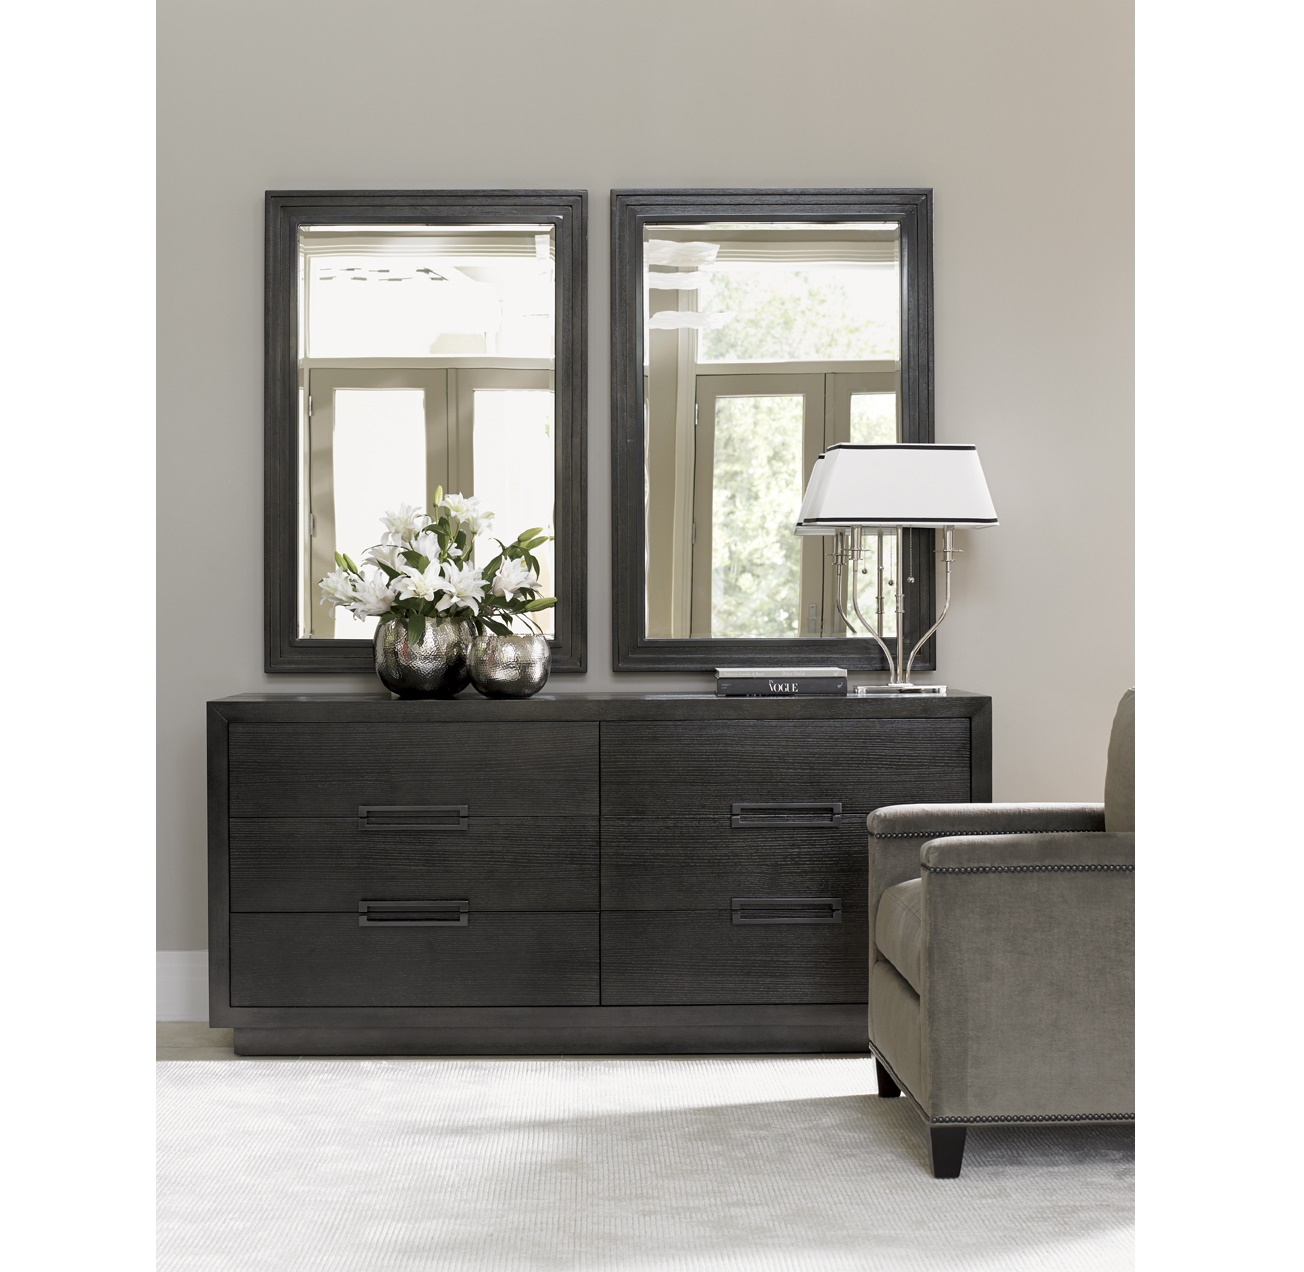 Lexington Cheap Decorative Mirrors for Living Room Brooklyn, New York - 2